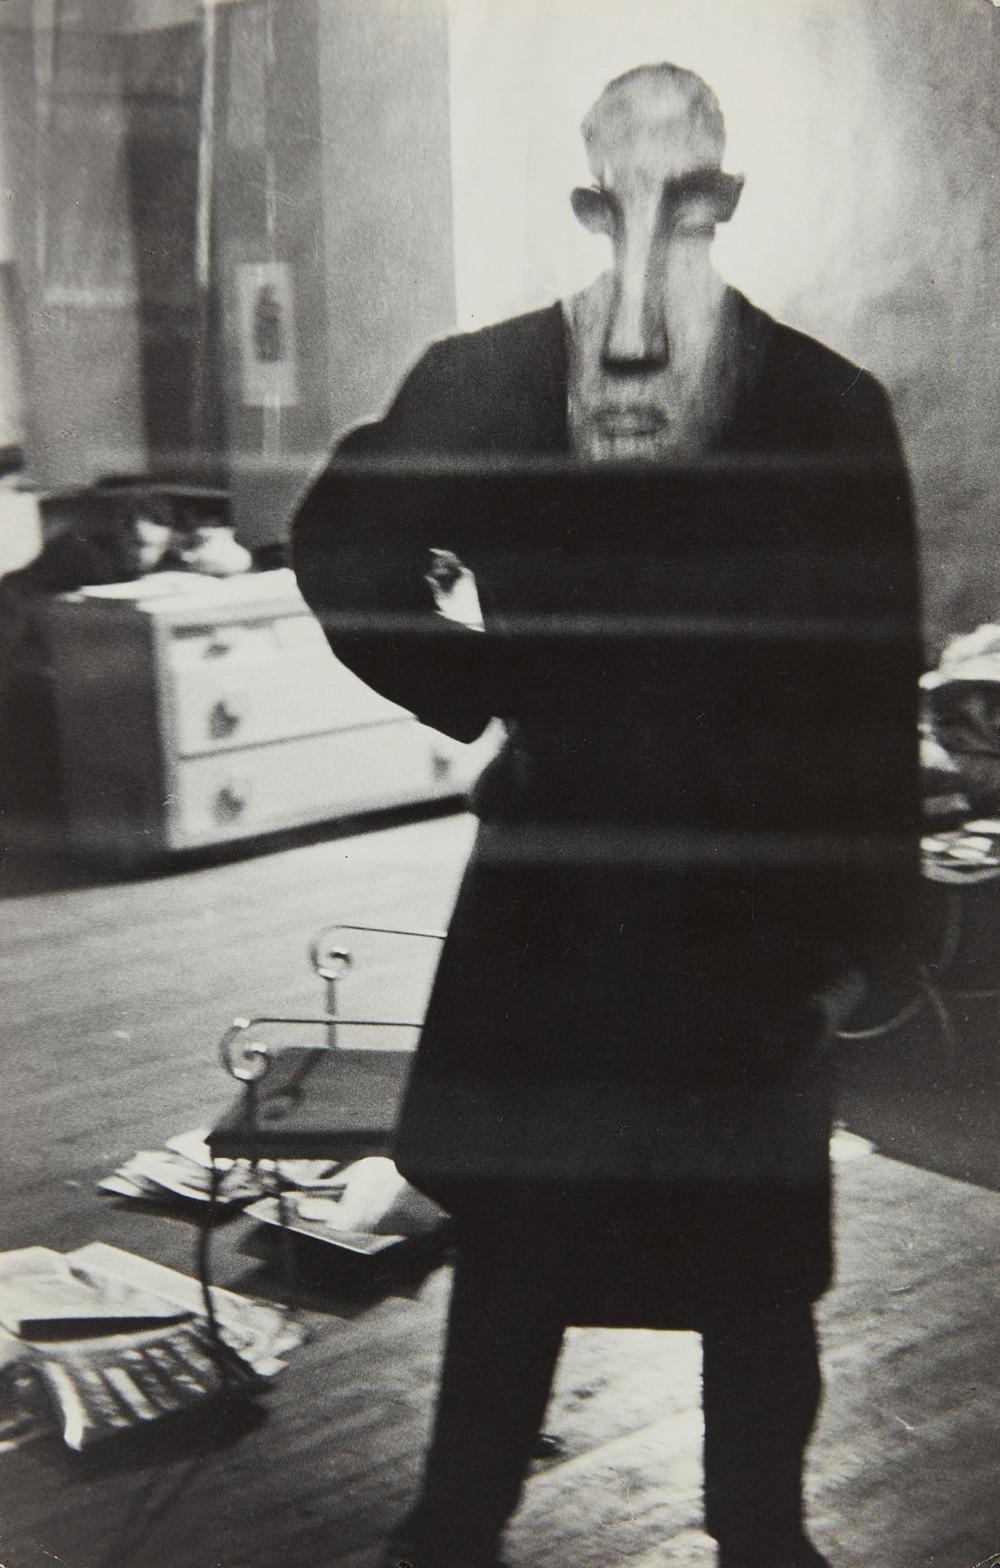 Луи Фаурер – лирик с фотокамерой на улицах Нью-Йорка 19